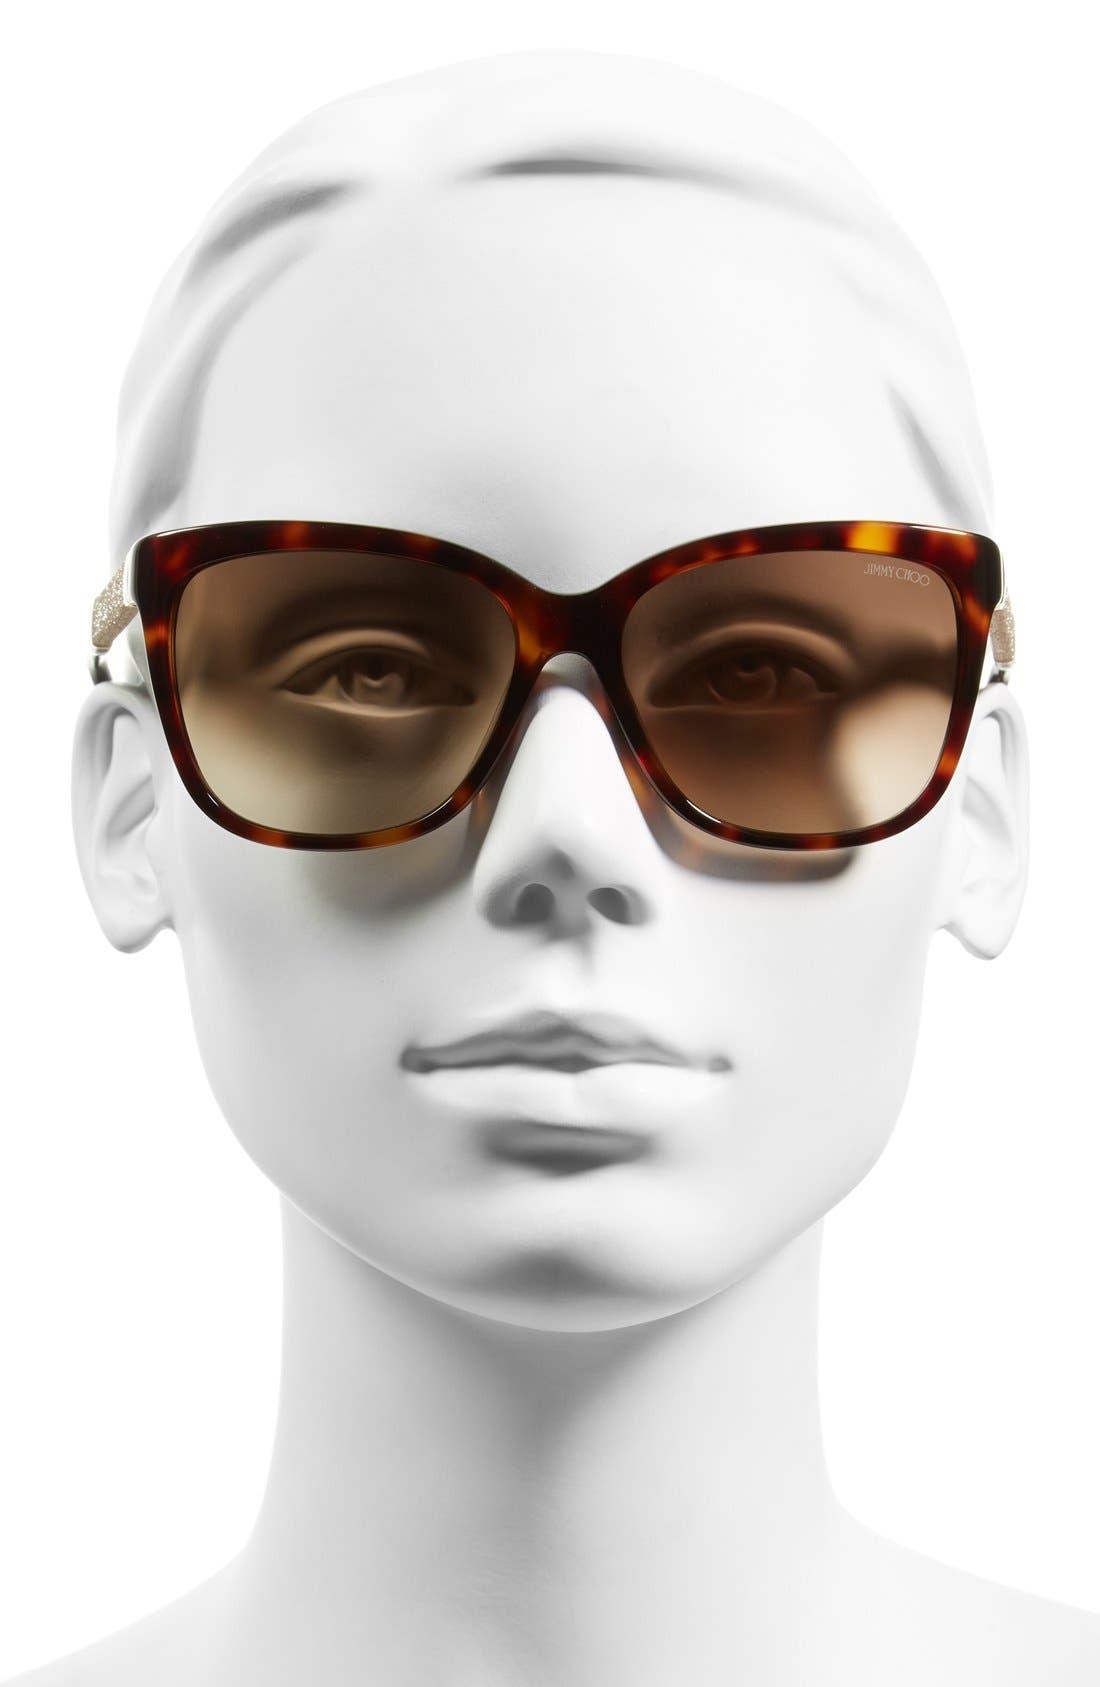 'Coras' 56mm Retro Sunglasses,                             Alternate thumbnail 2, color,                             Dark Havana